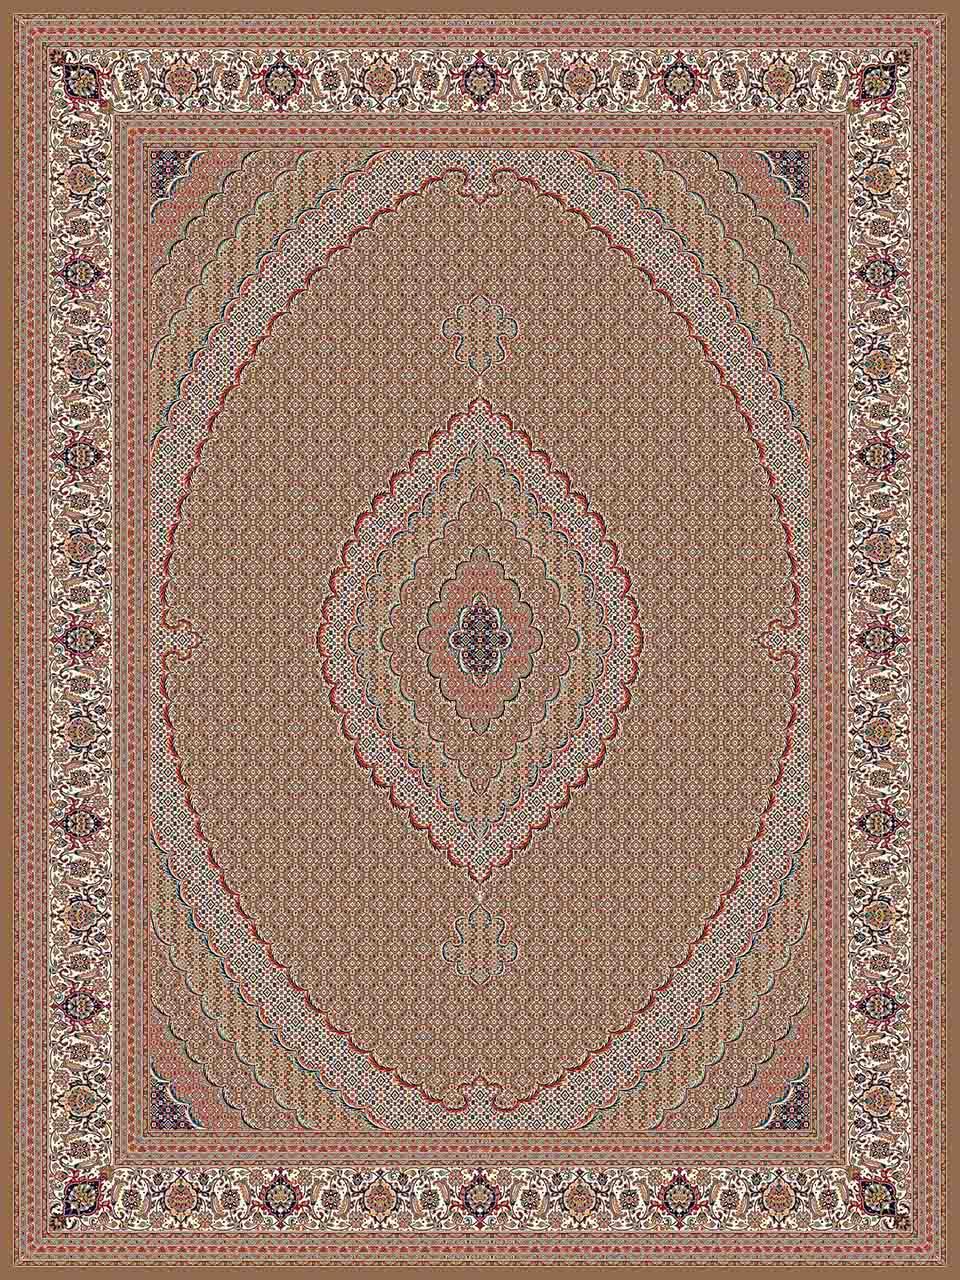 فرش (25015) اکریلیک - 8 رنگ - 700 شانه - گردويي - تراکم 2550